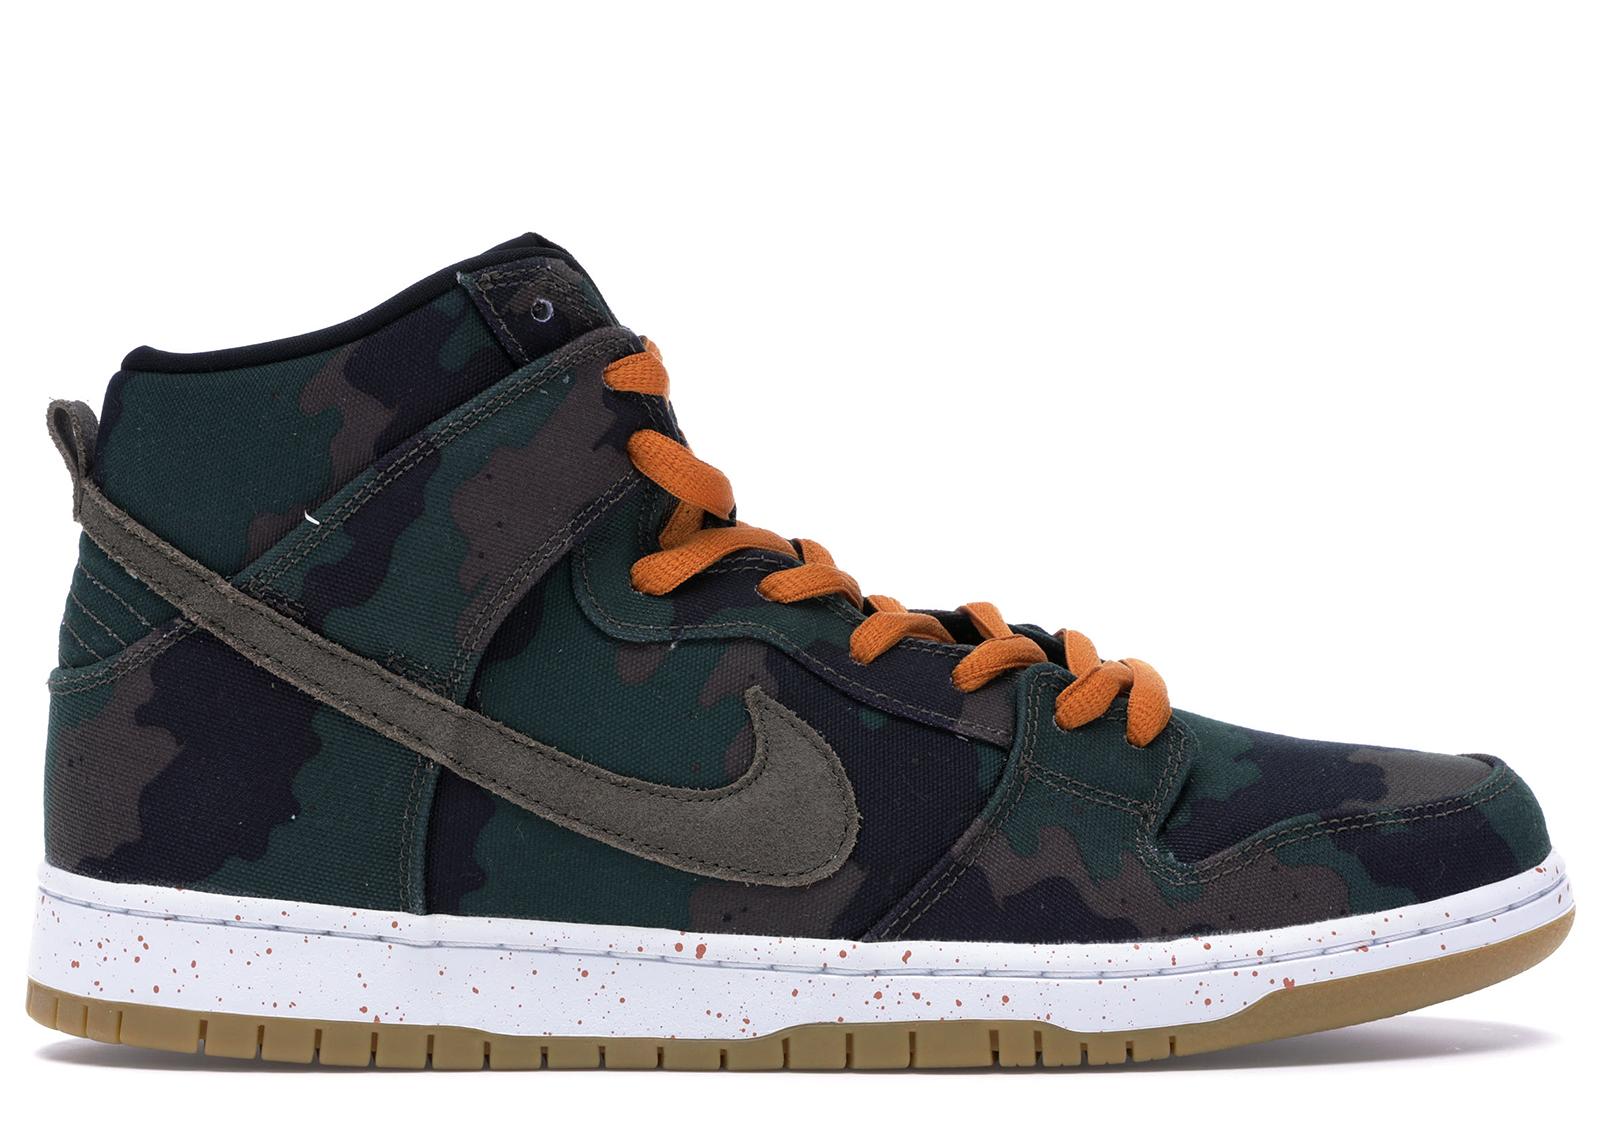 Nike Dunk SB High FiveOneO Camo